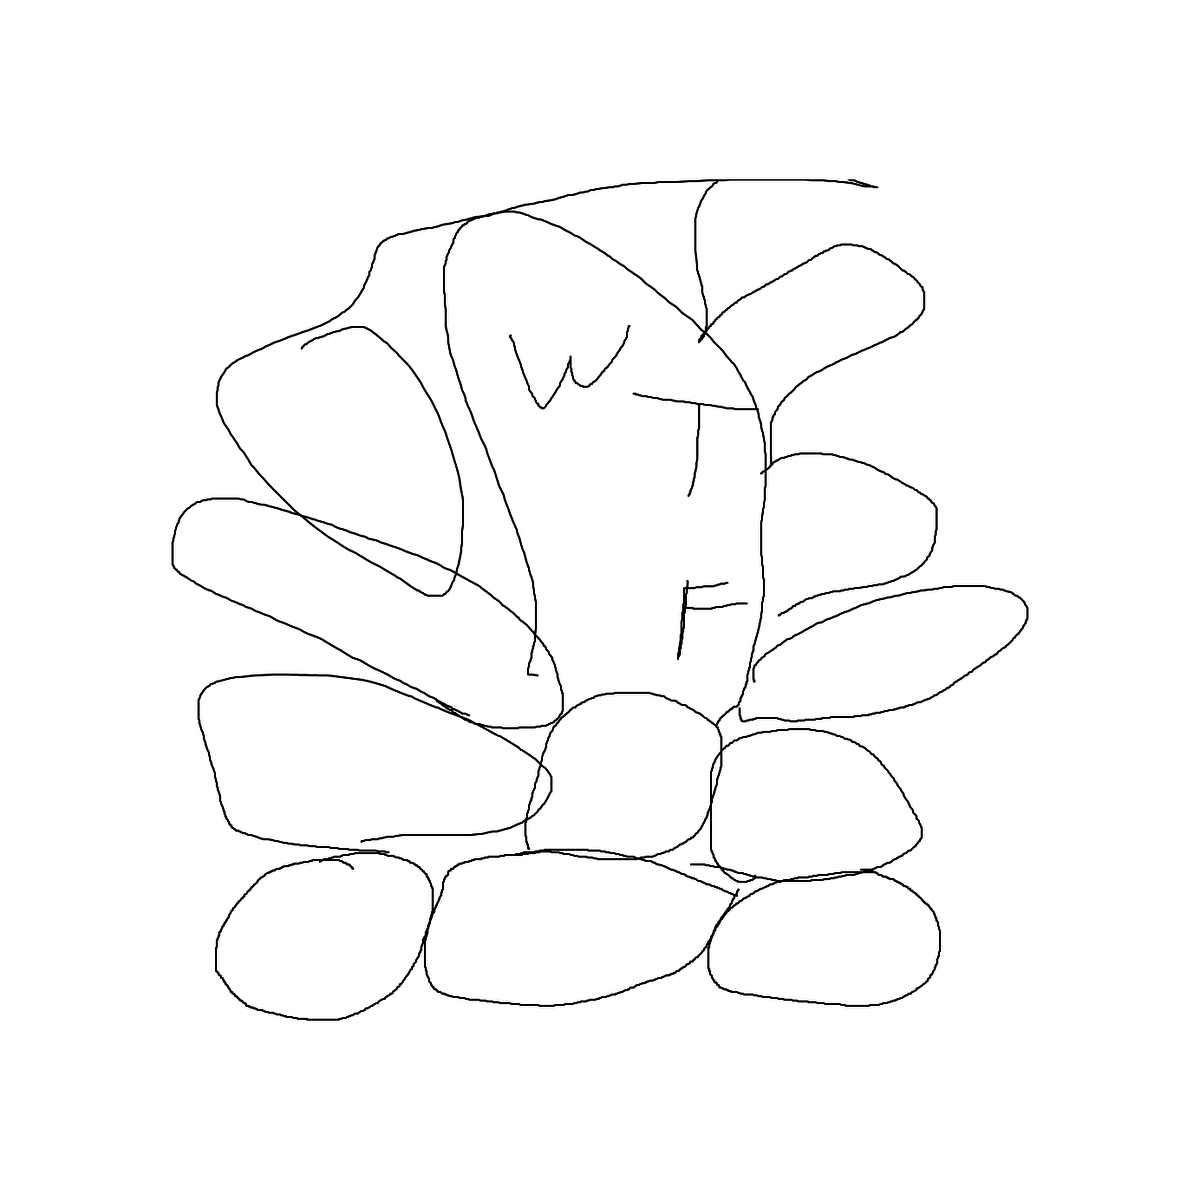 BAAAM drawing#22985 lat:53.6521301269531250lng: -3.0131981372833250